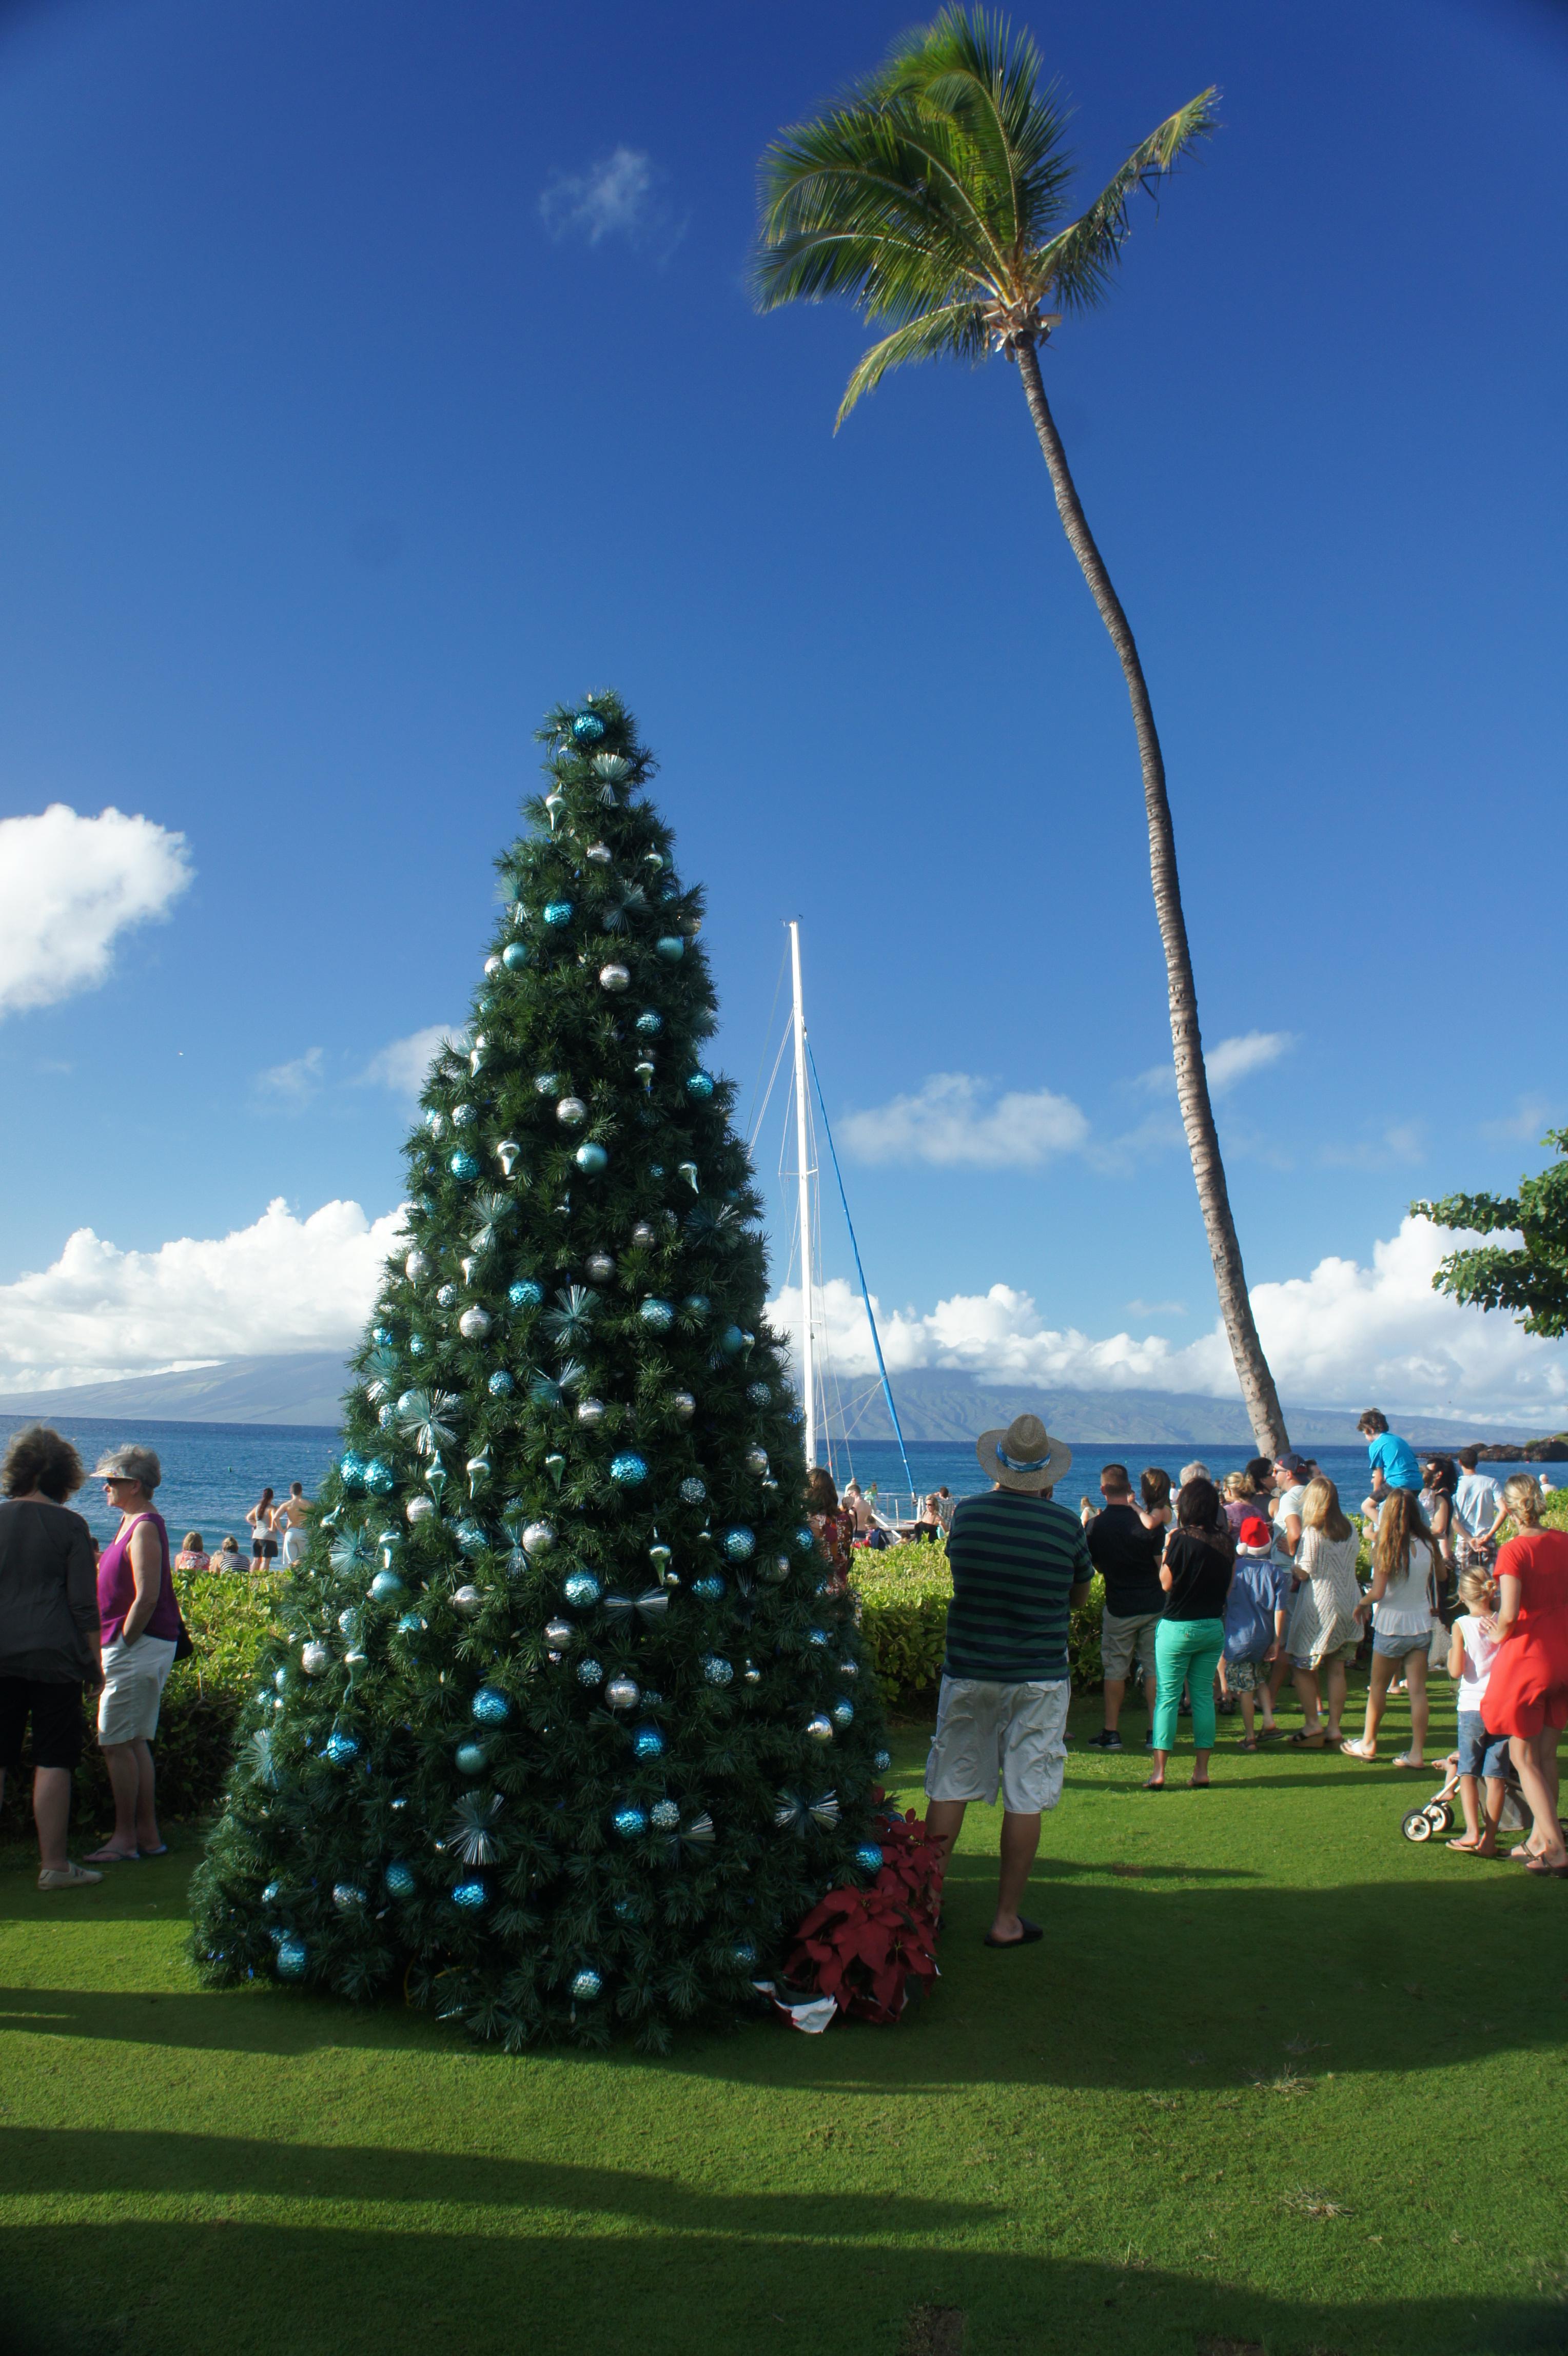 Christmas Tree On A Budget